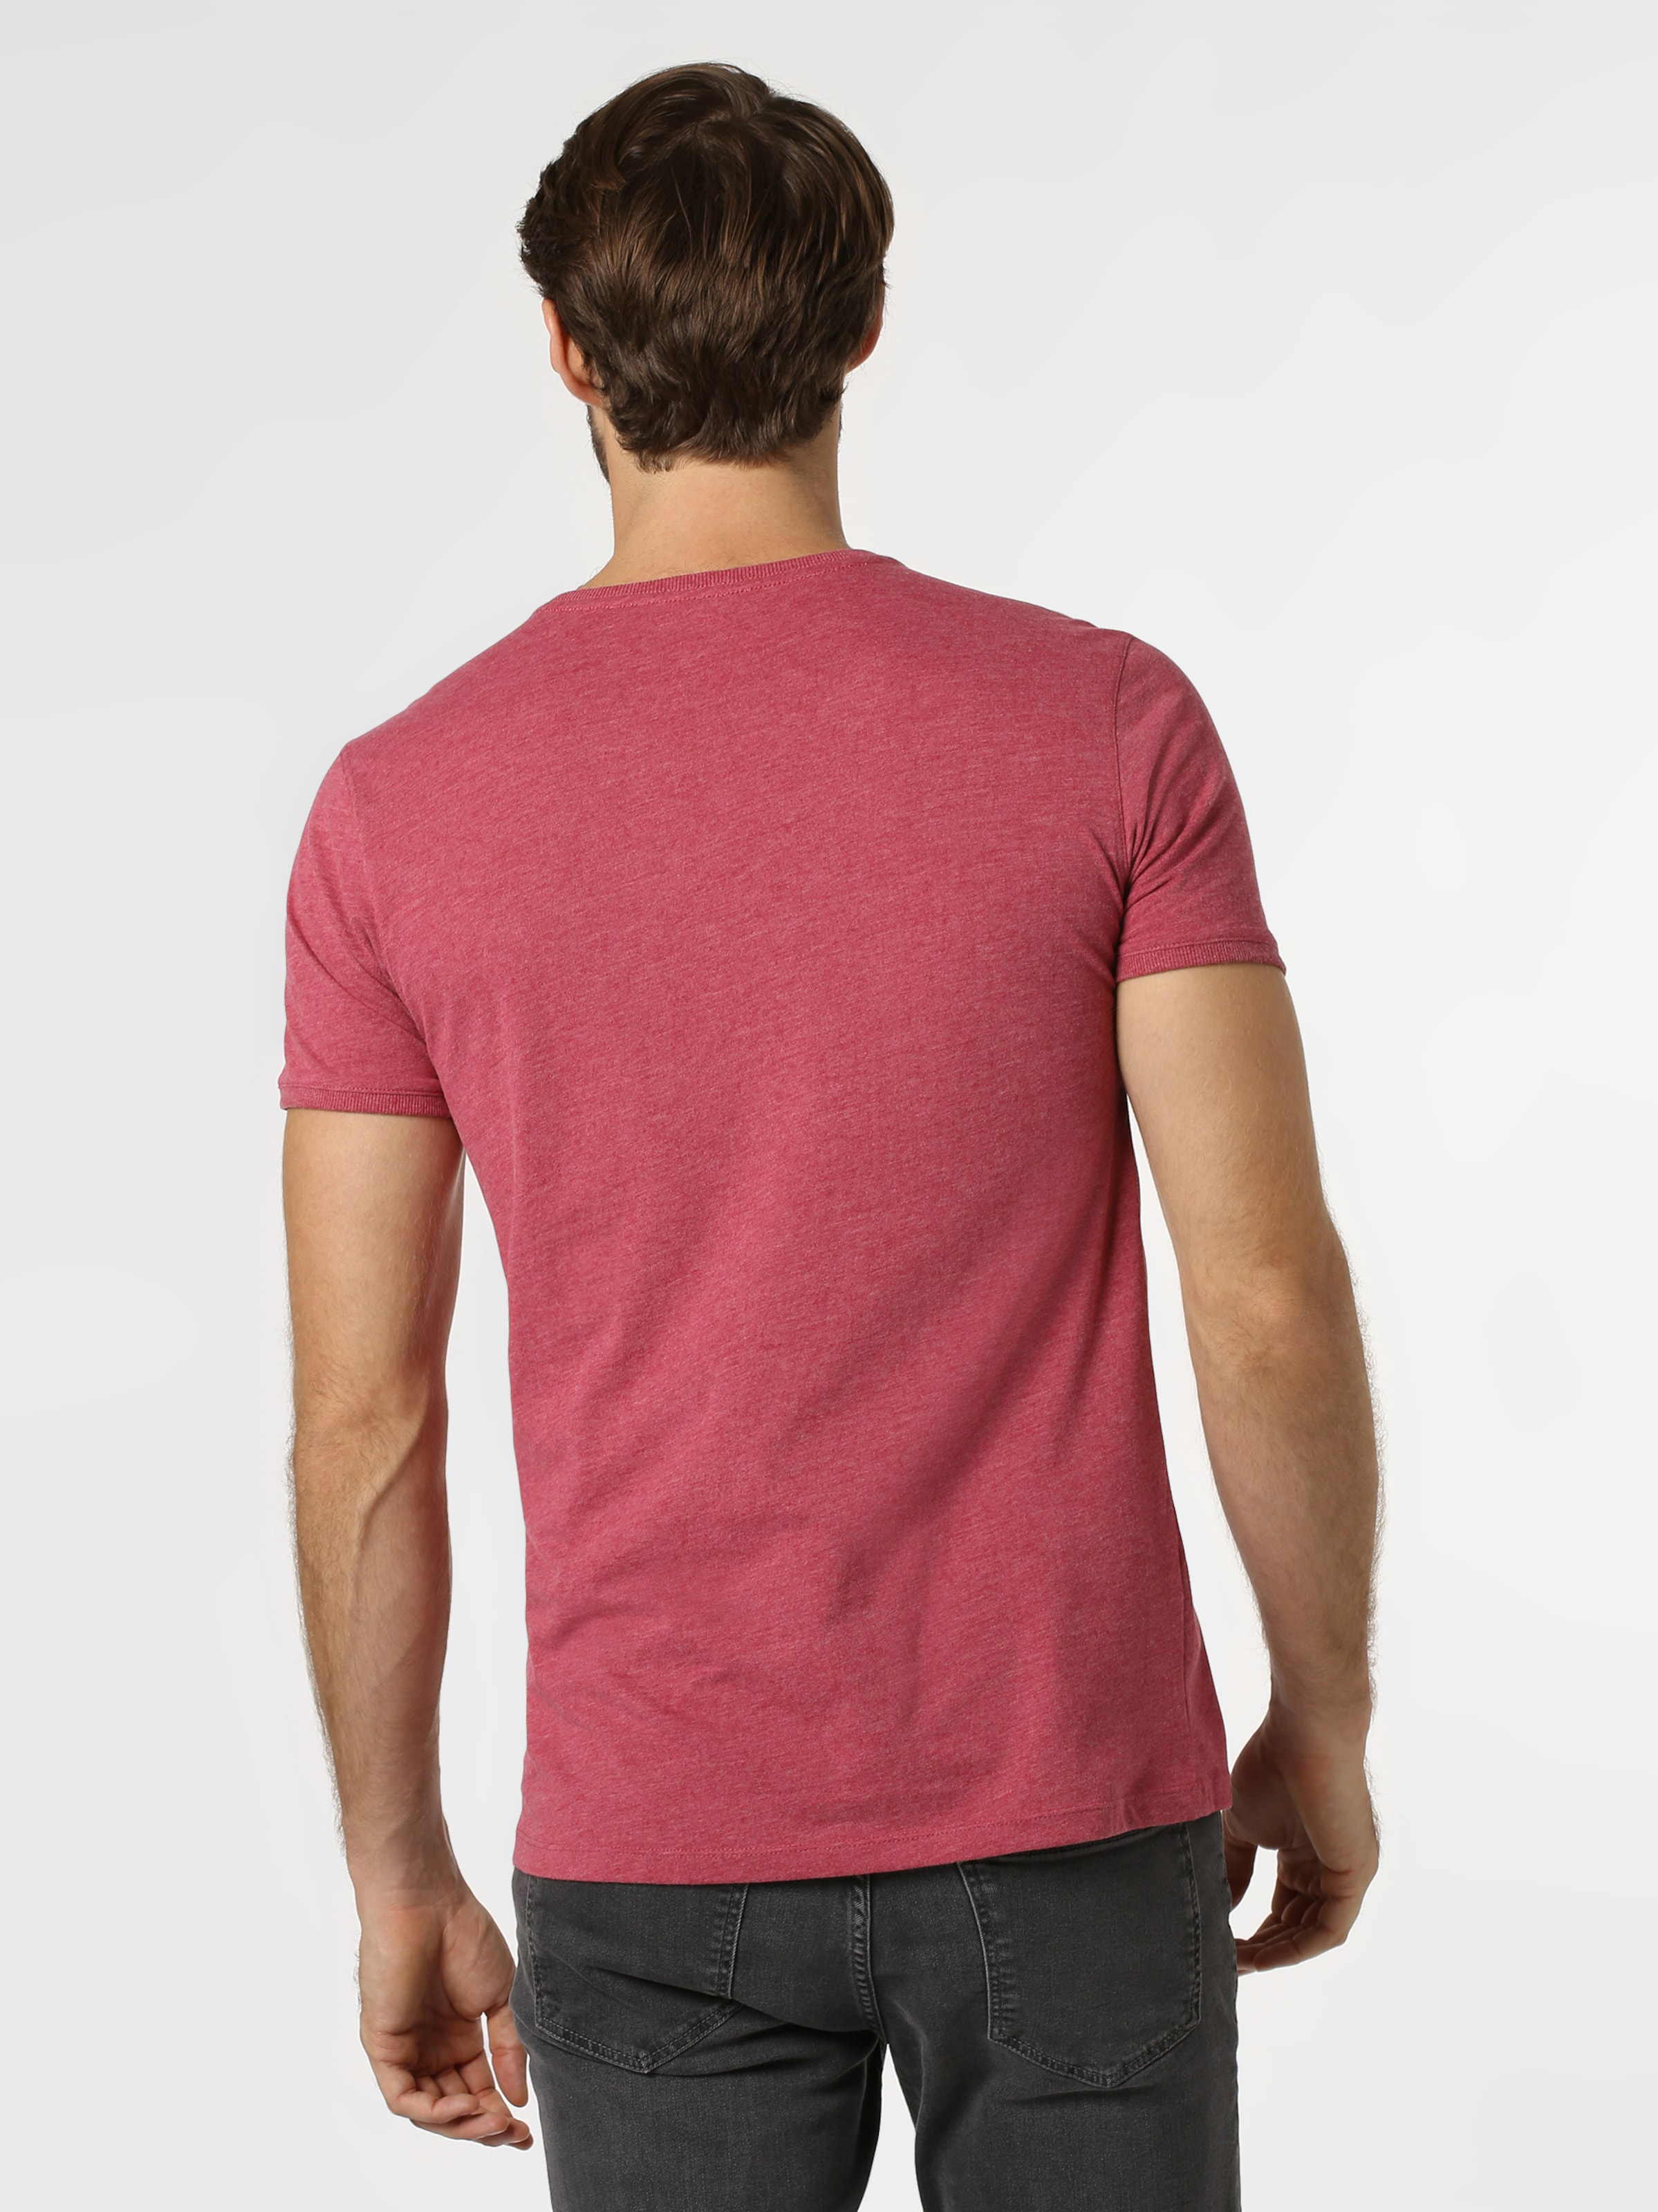 shirt Pastellrot In T Nils Sundström q4AL5j3R